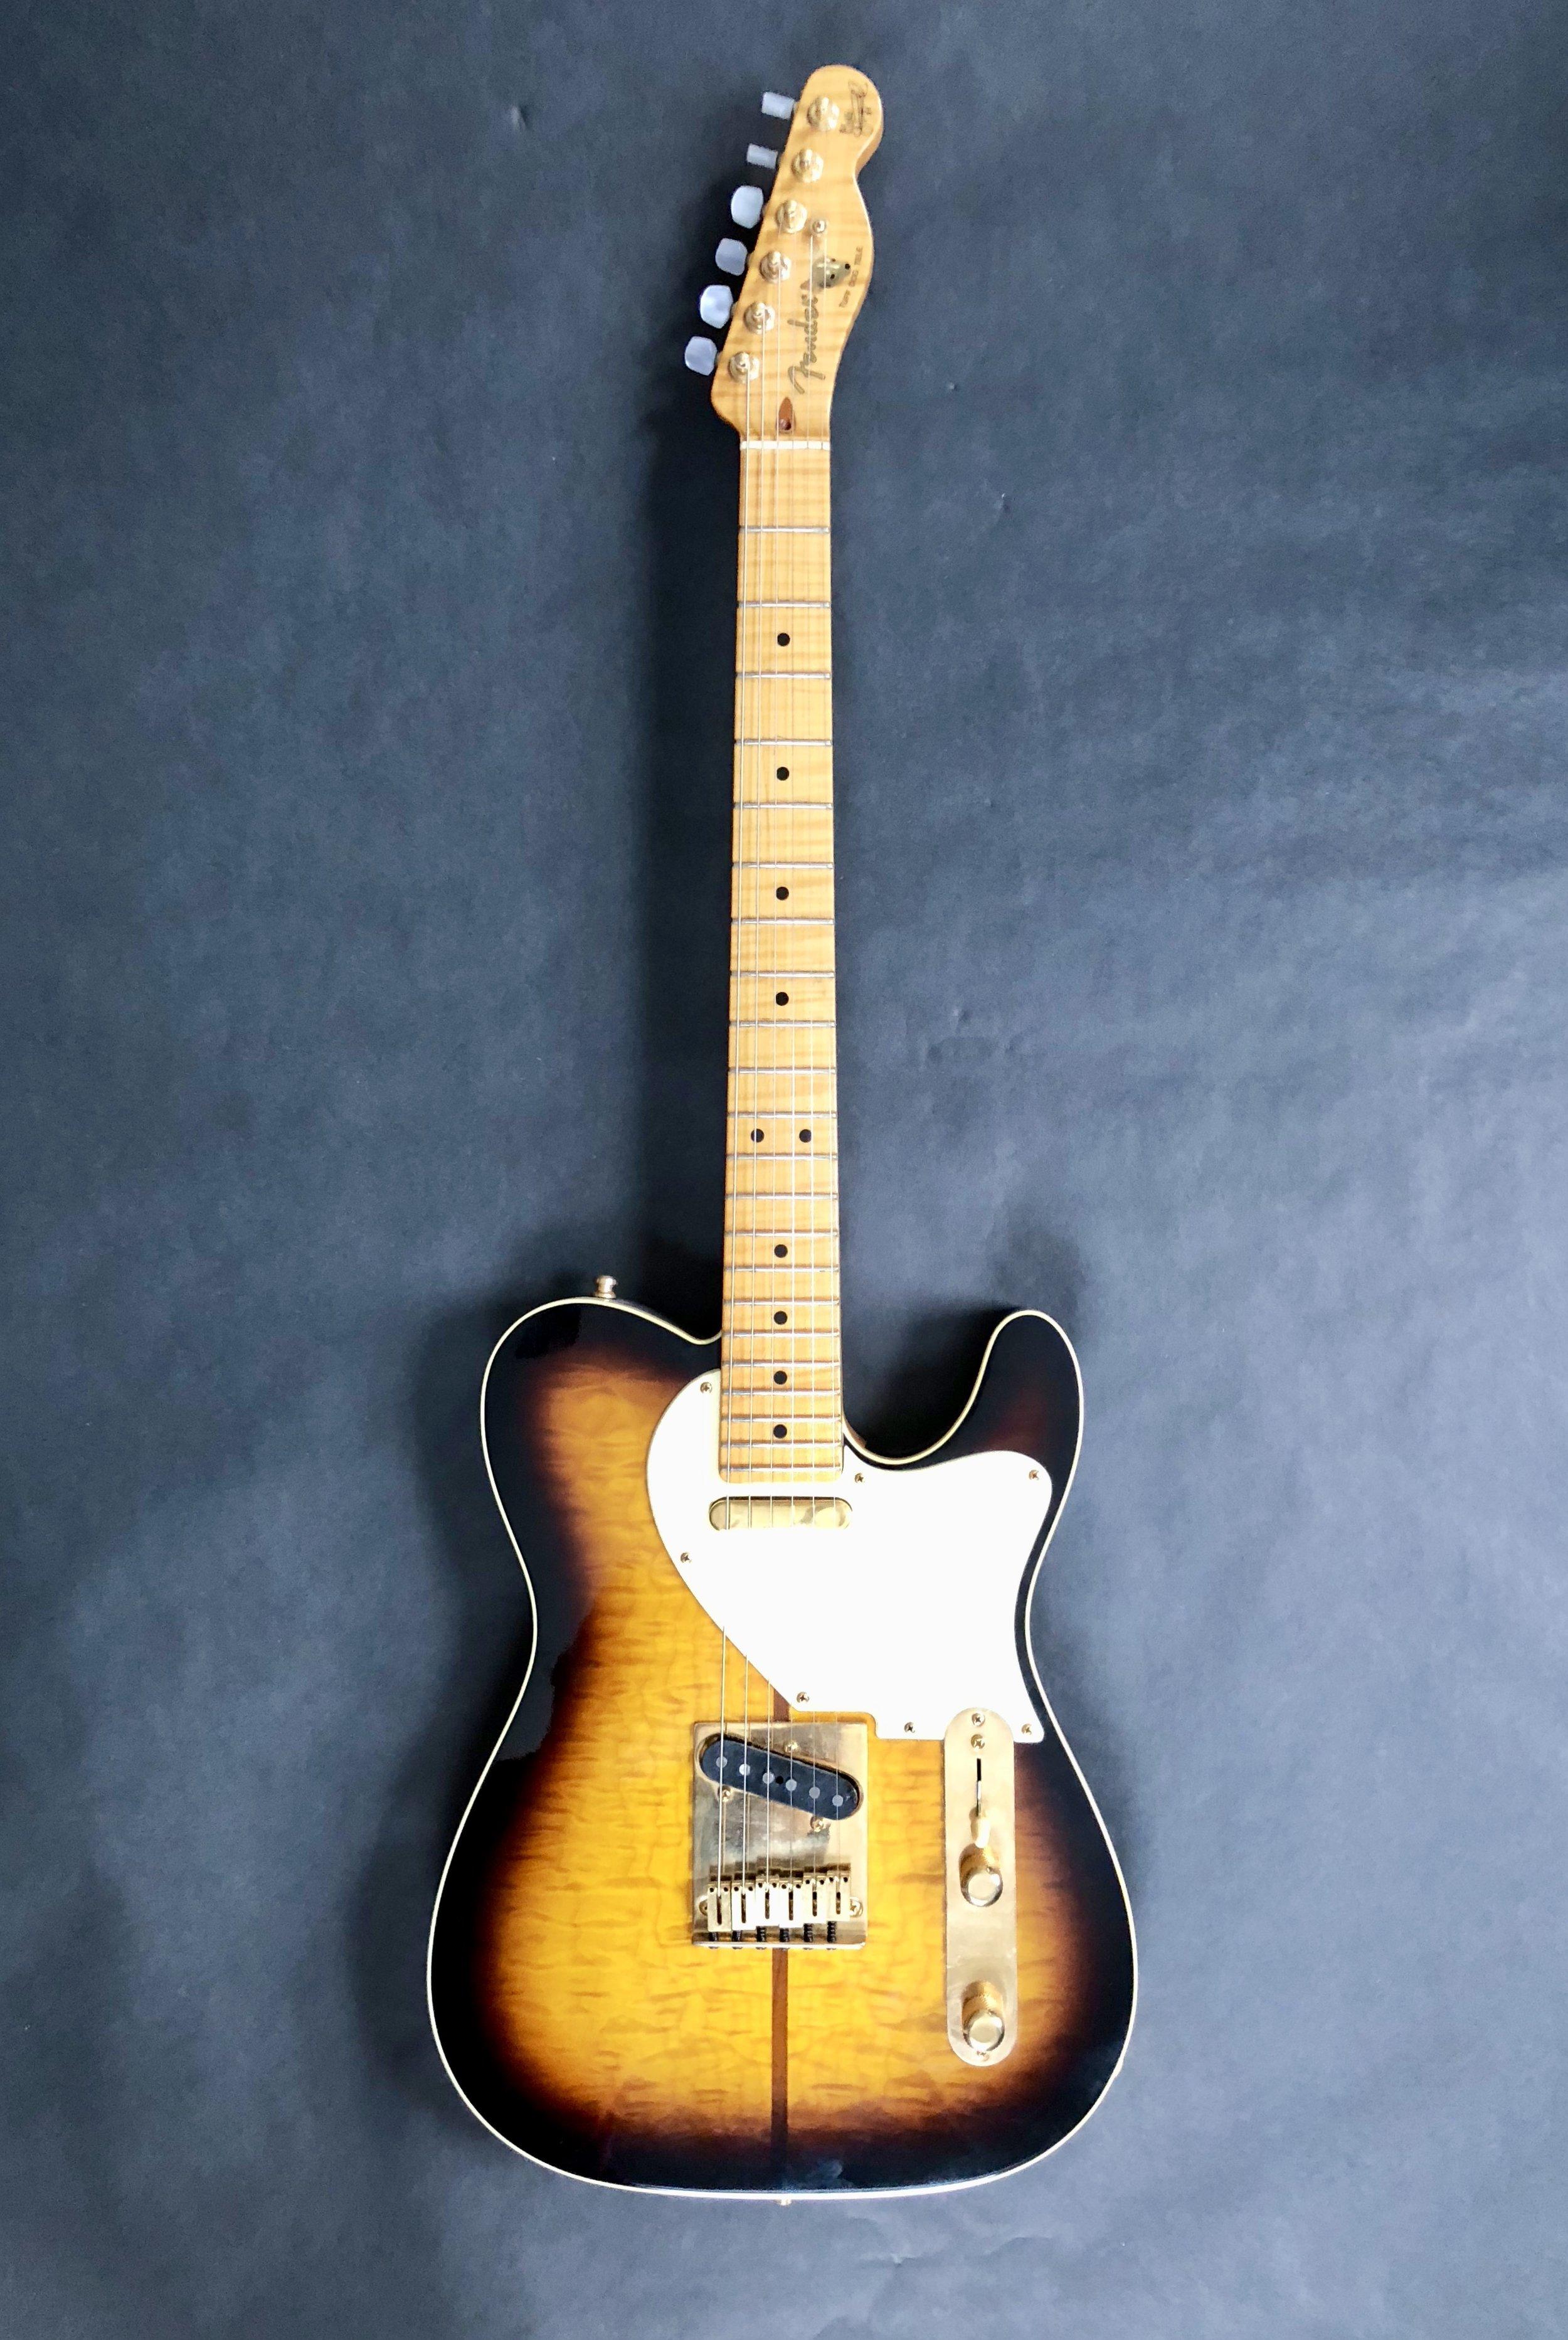 Fender Custom Shop Merle Haggard Tuff Dog Signature Telecaster